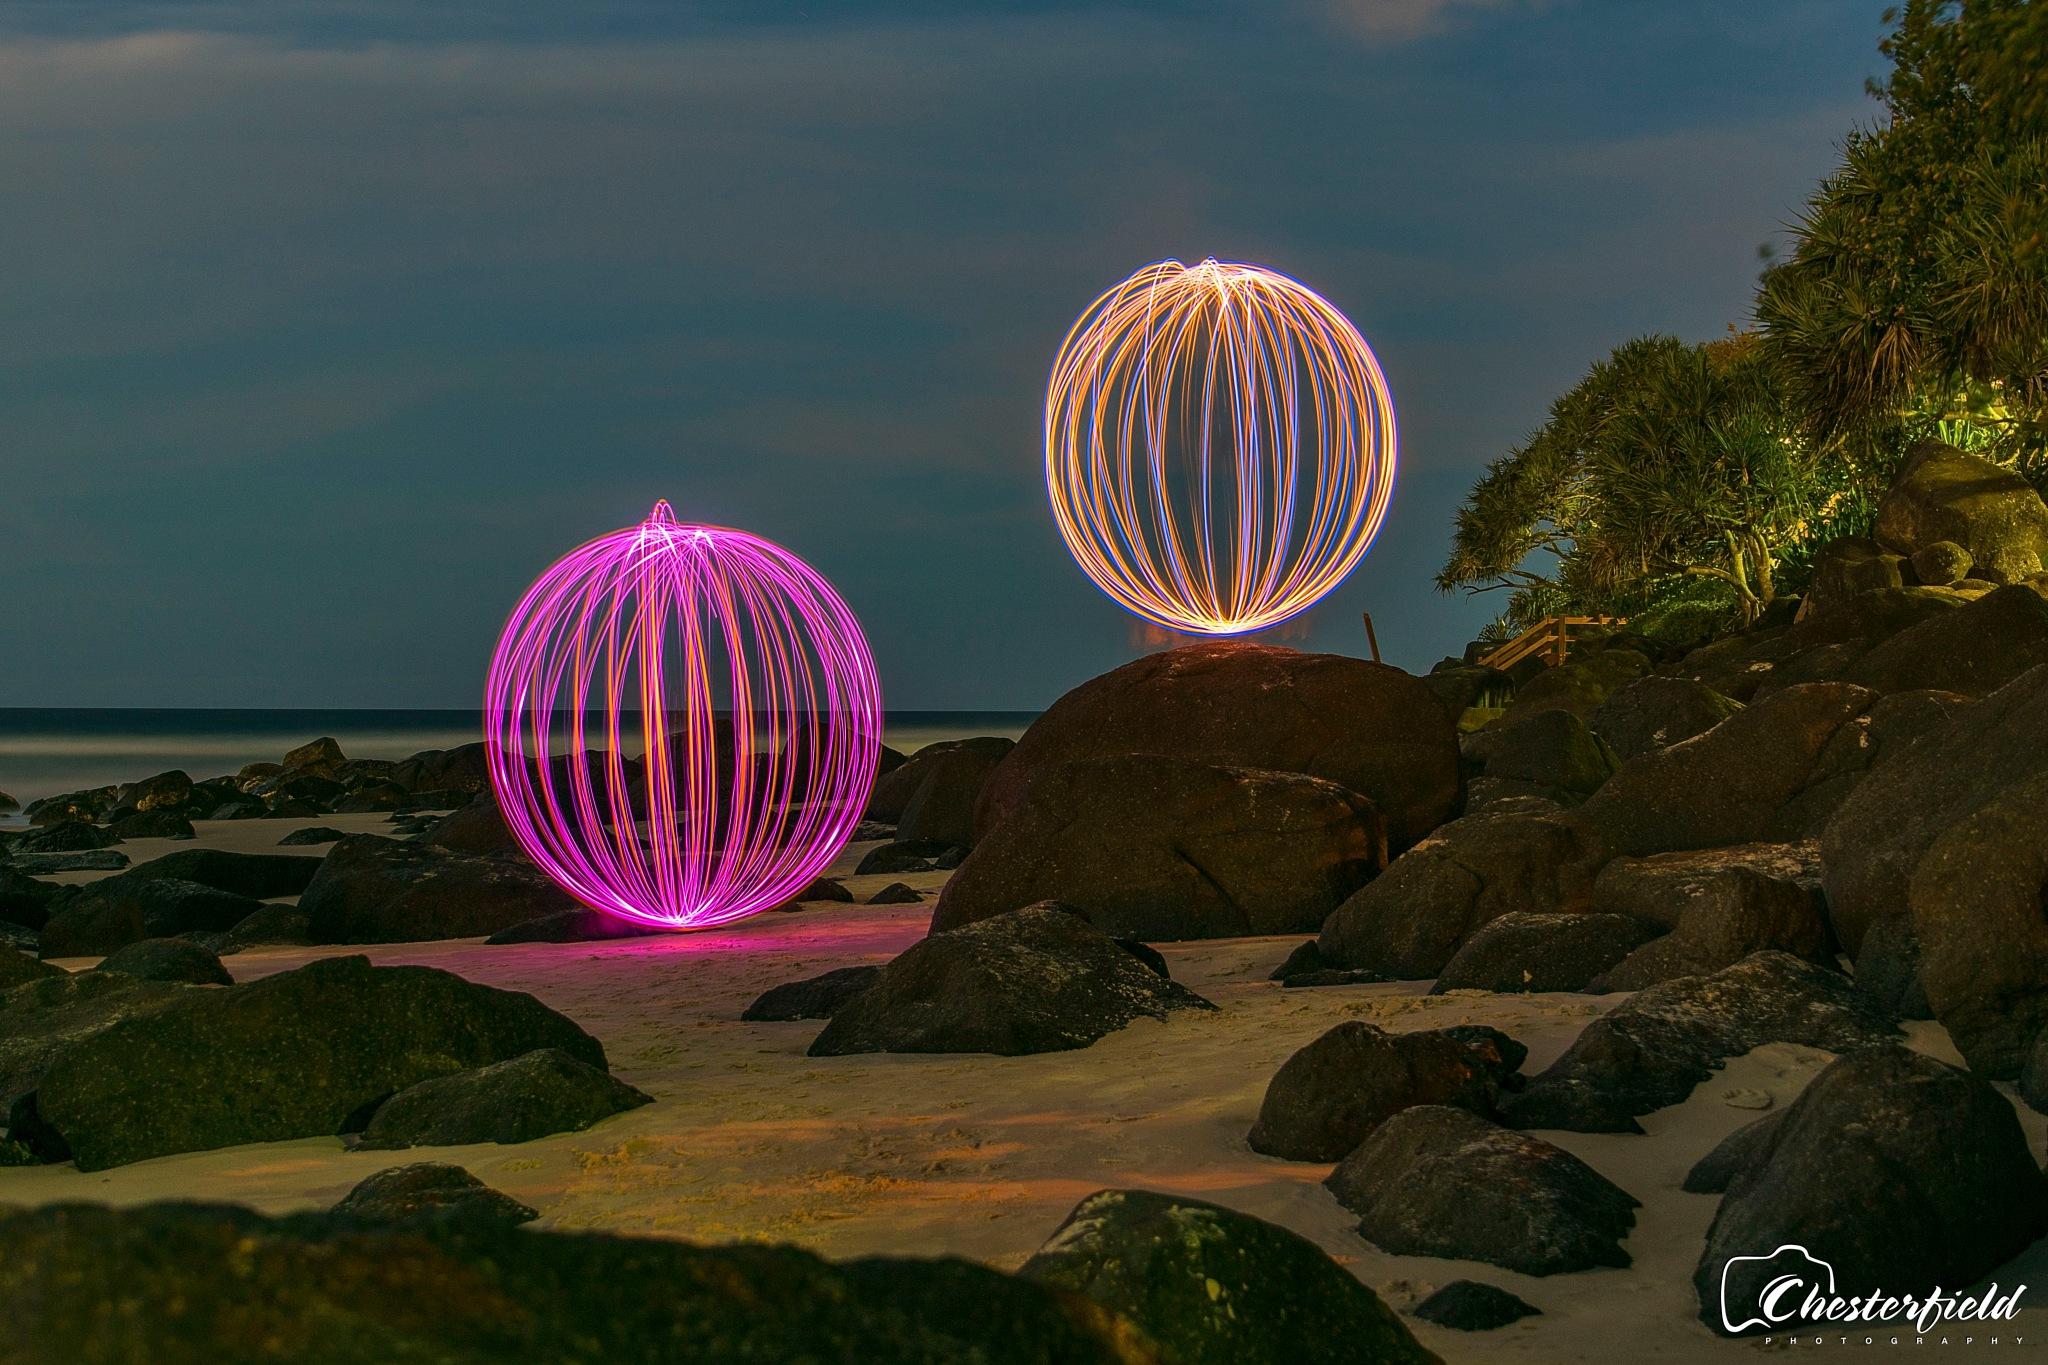 Balls of light by Dchester1001